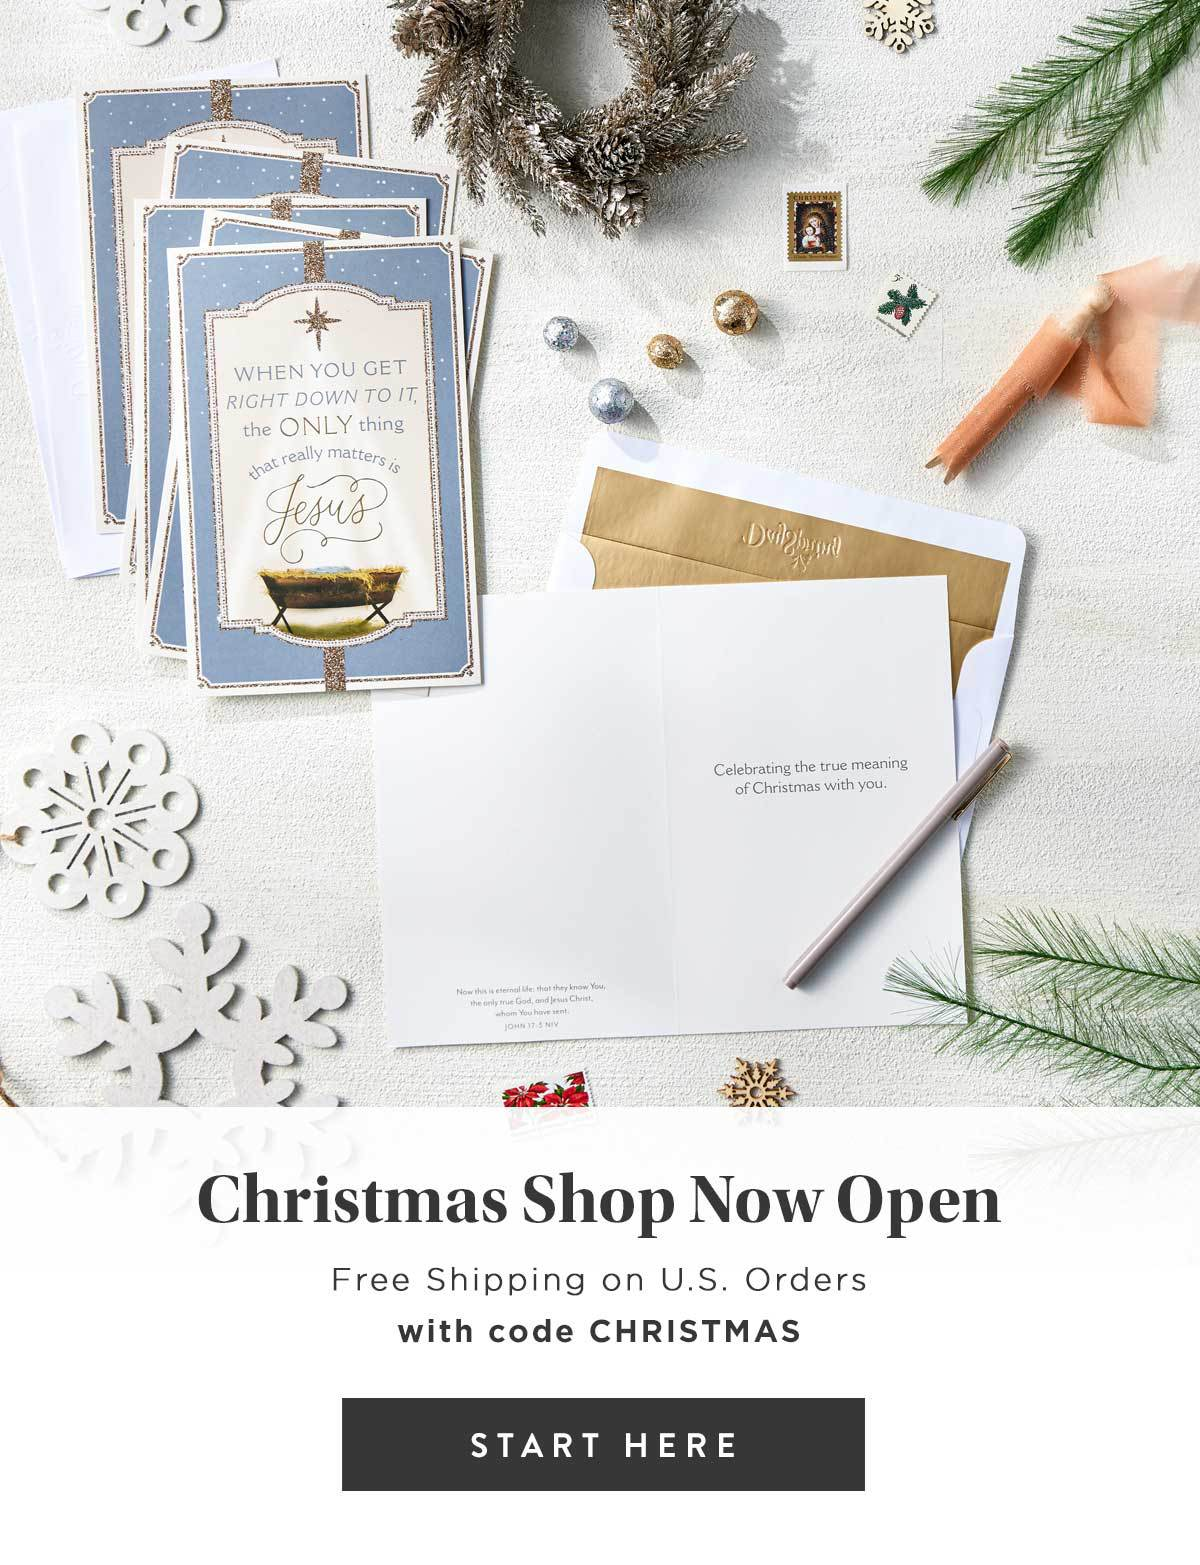 DaySpring Christmas Shop Launch